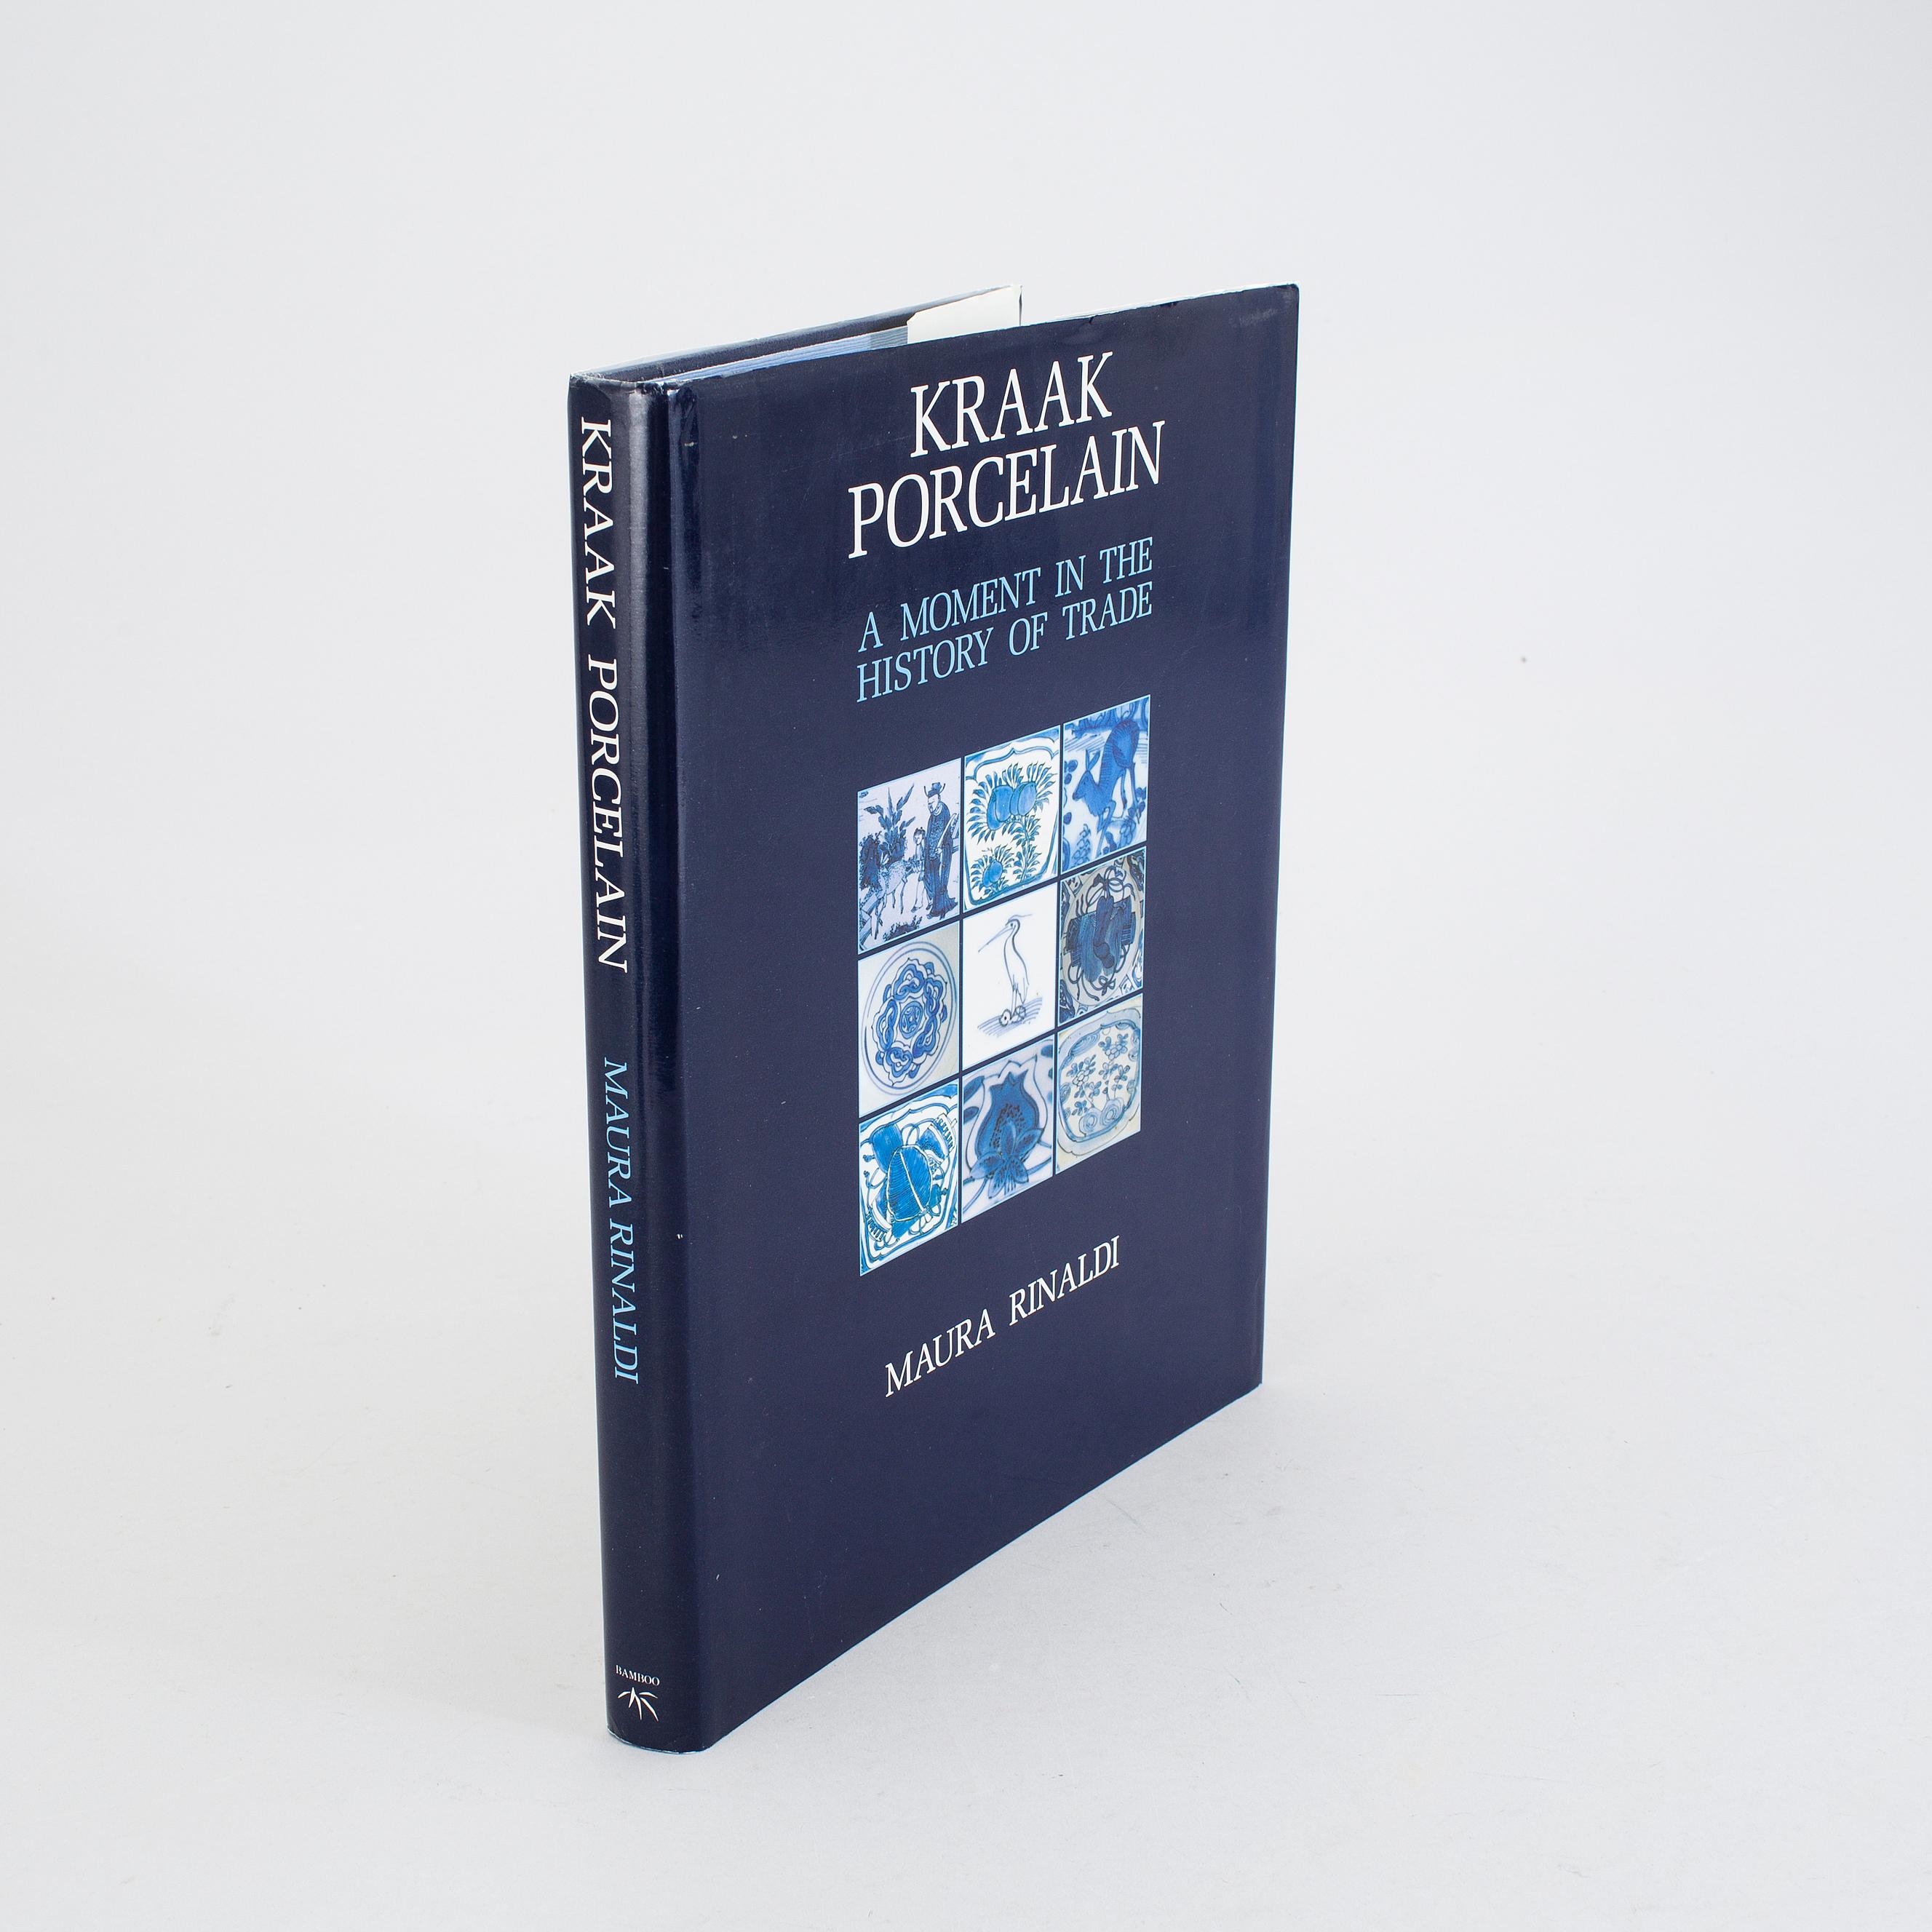 Book kraak porcelain maura rinaldi bamboo publishing 1989 book kraak porcelain maura rinaldi bamboo publishing 1989 bukowskis fandeluxe Gallery